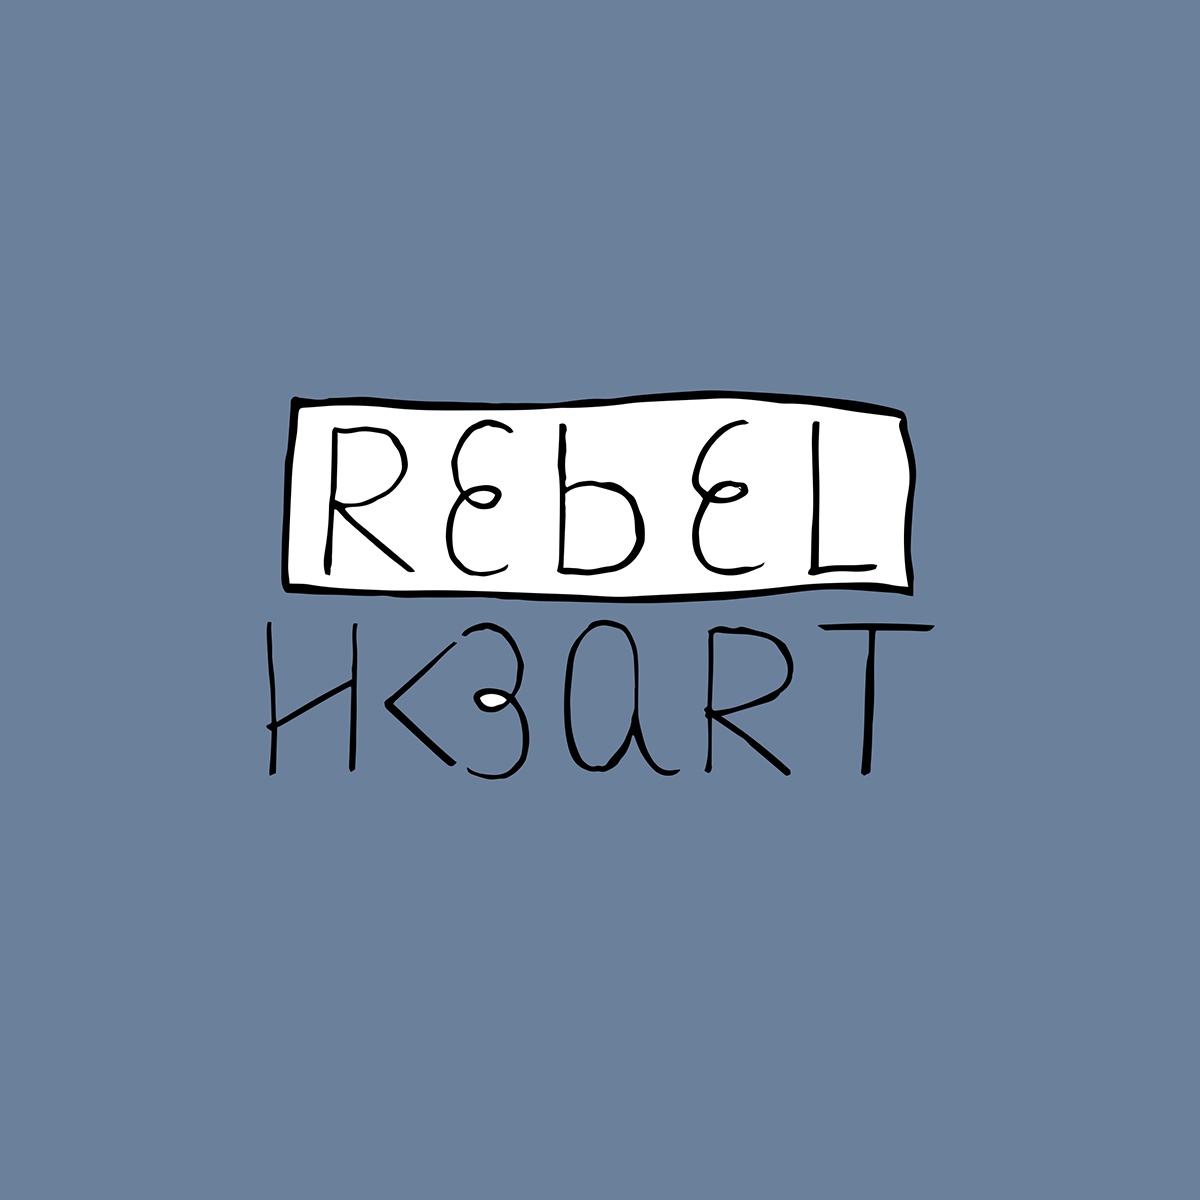 Logotipo Rebel Heart - Oh, Thaís!